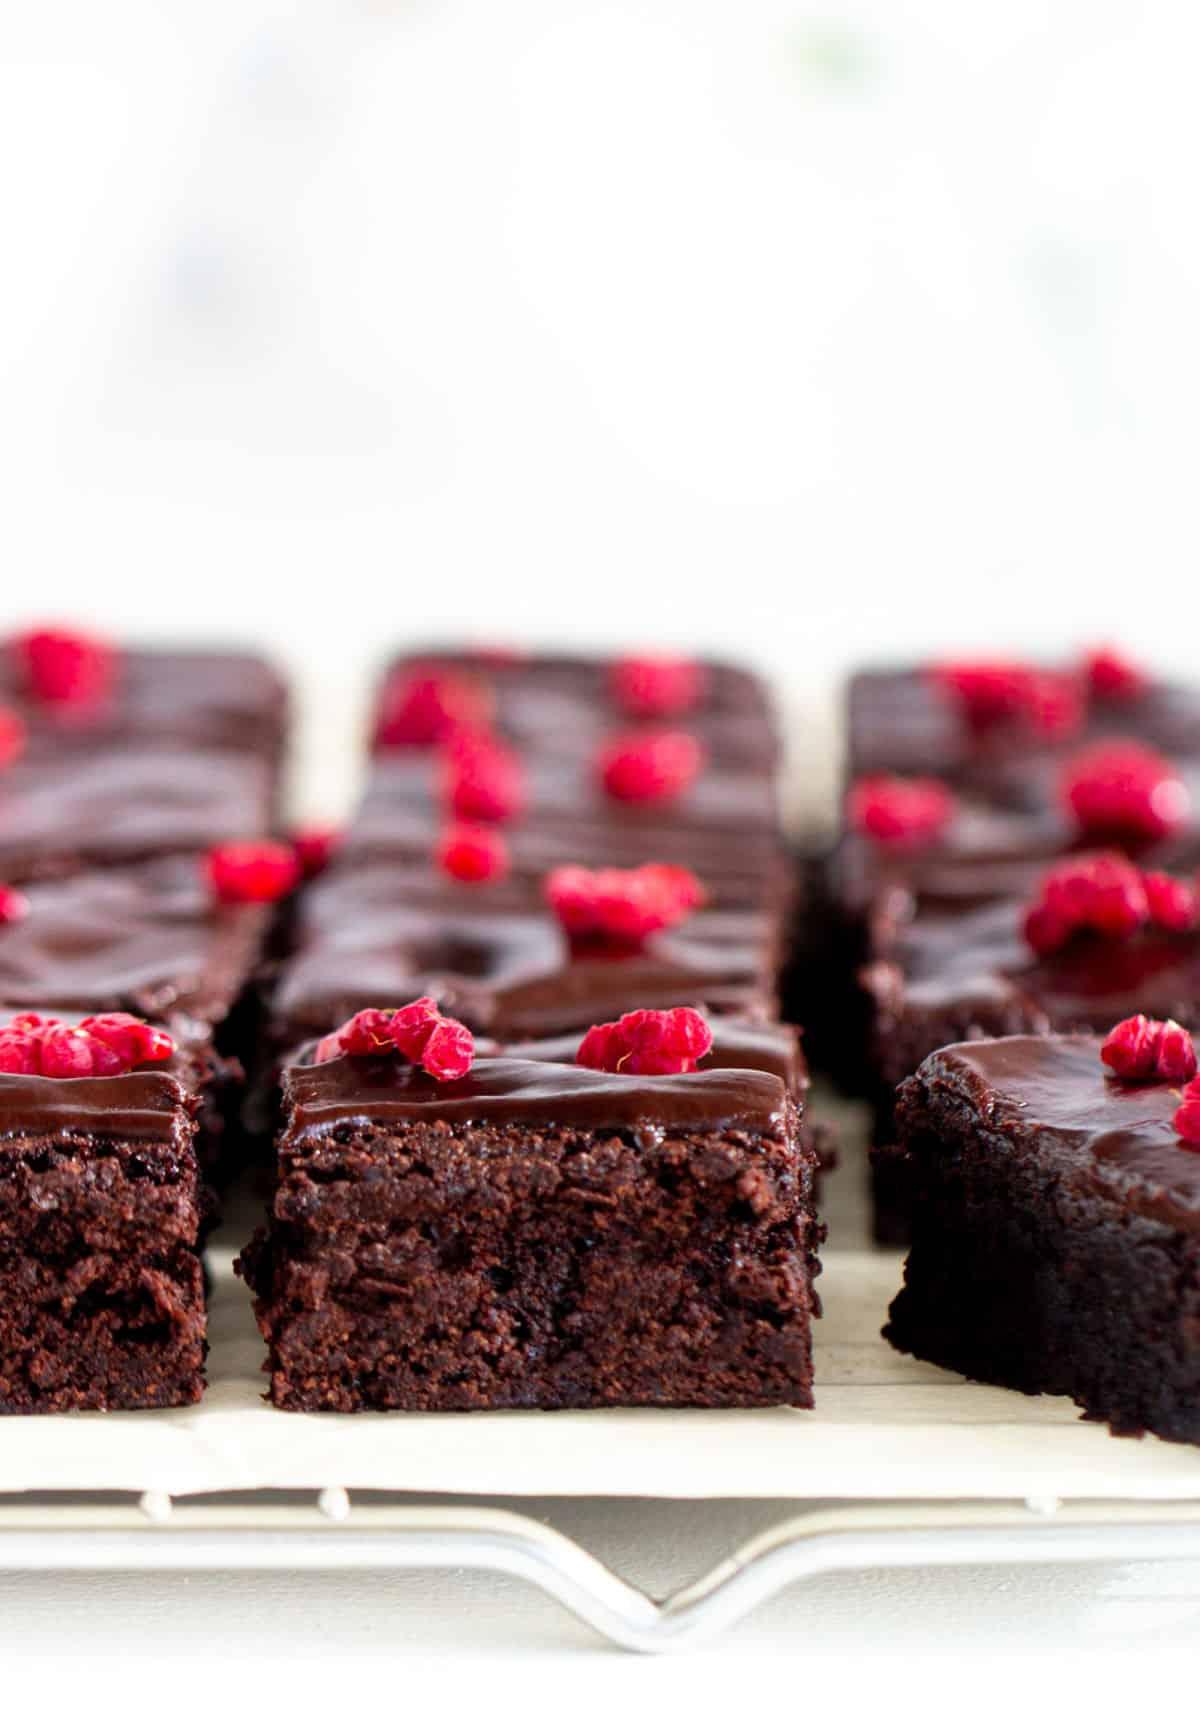 Frontal view of three rows of brownies, raspberries on top, on beige paper and rack